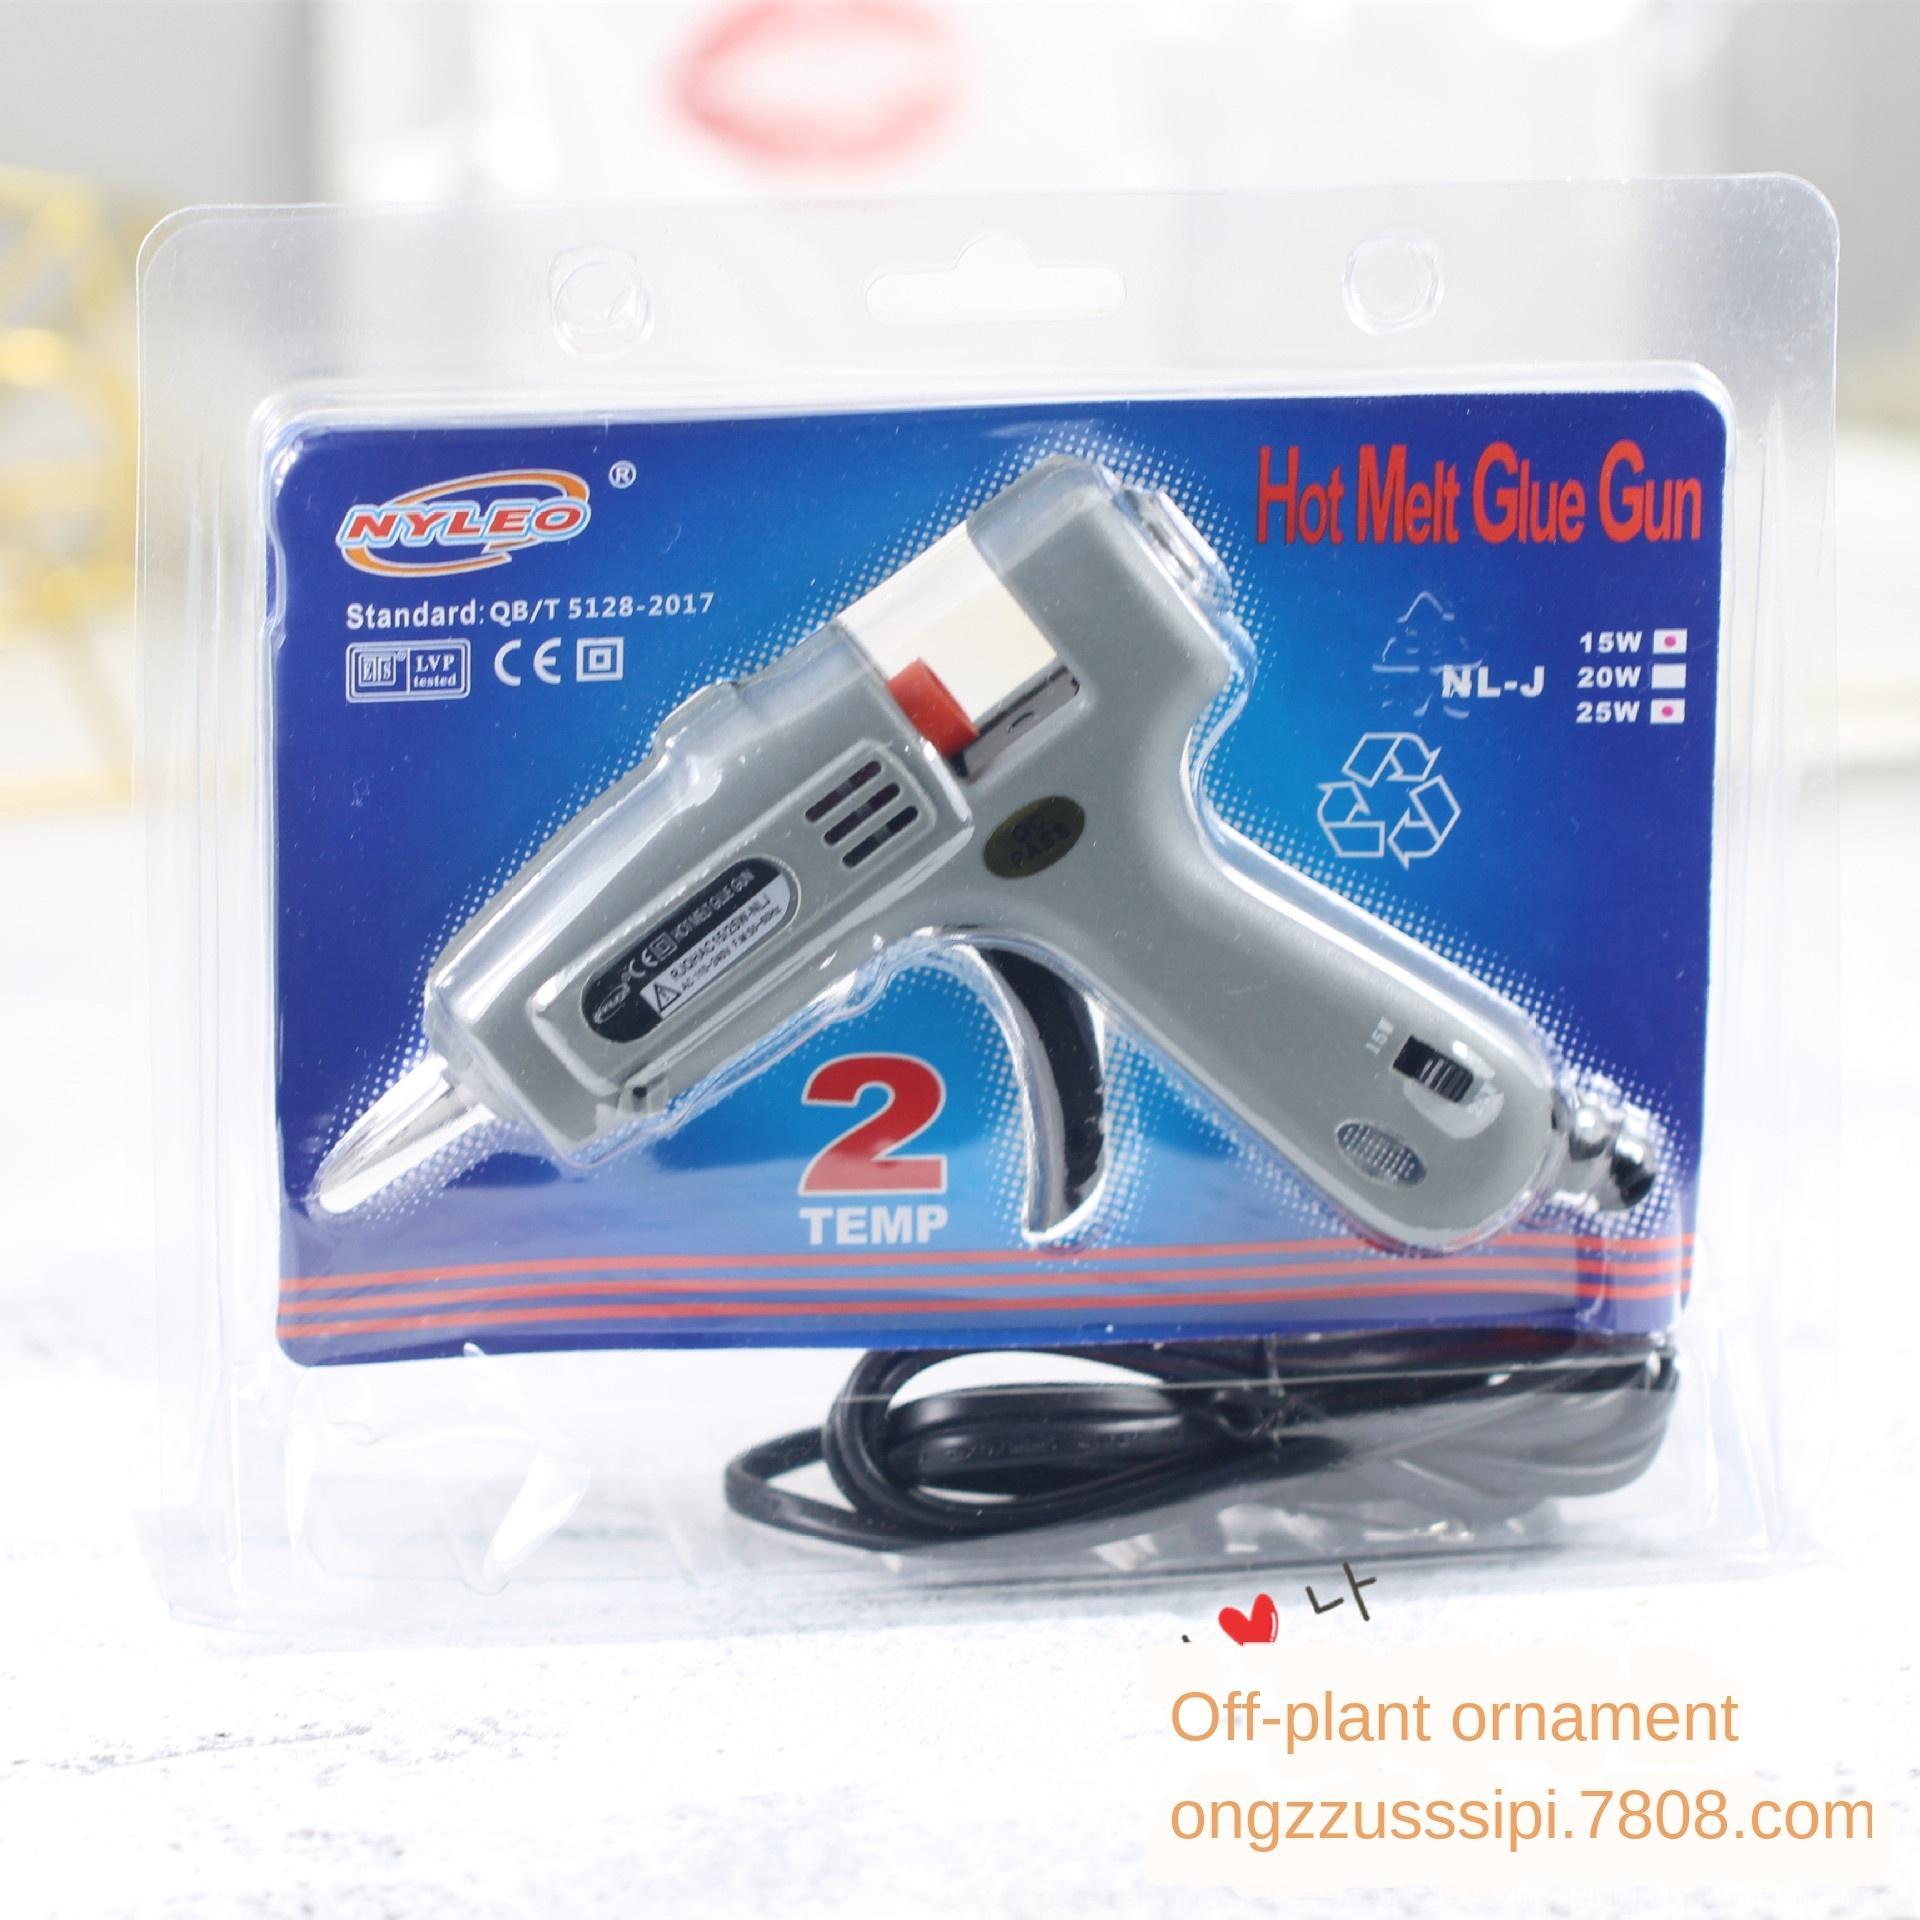 Po5gX hecho a mano pistola especial hecho a mano DIY DIY accesorios pegamento especial pistola de pegamento